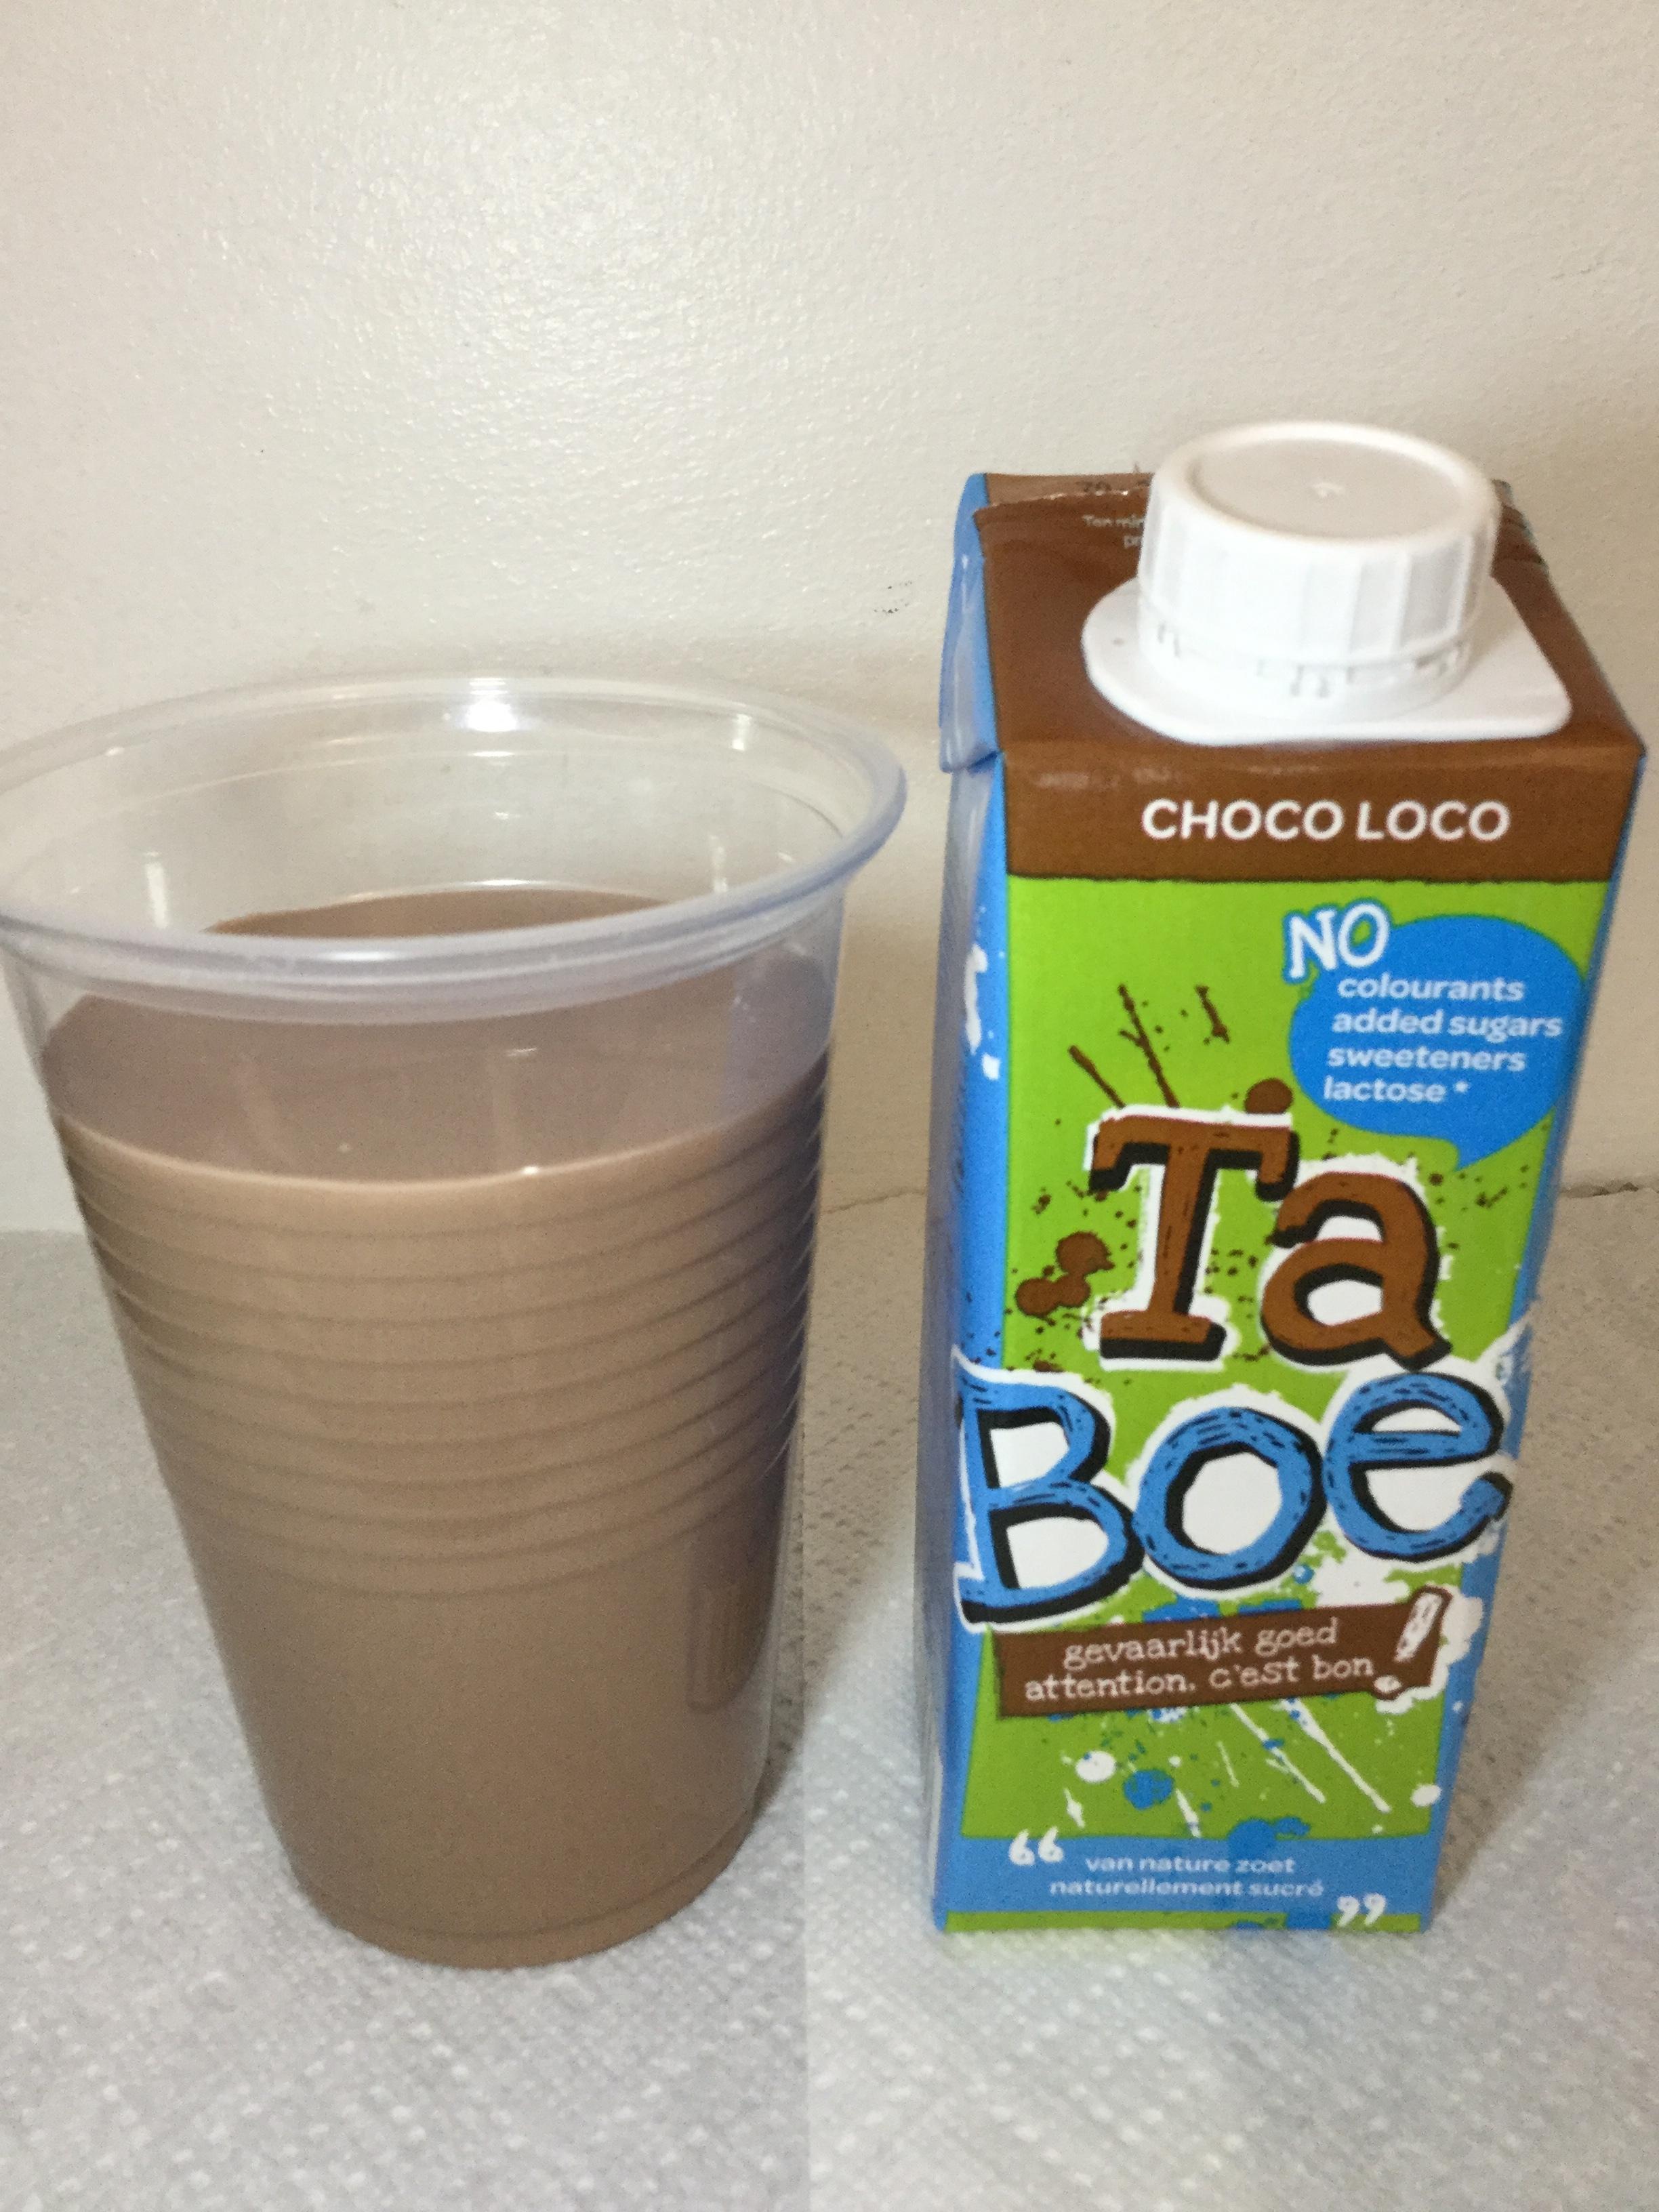 Inex Ta Boe Choco Loco Cup